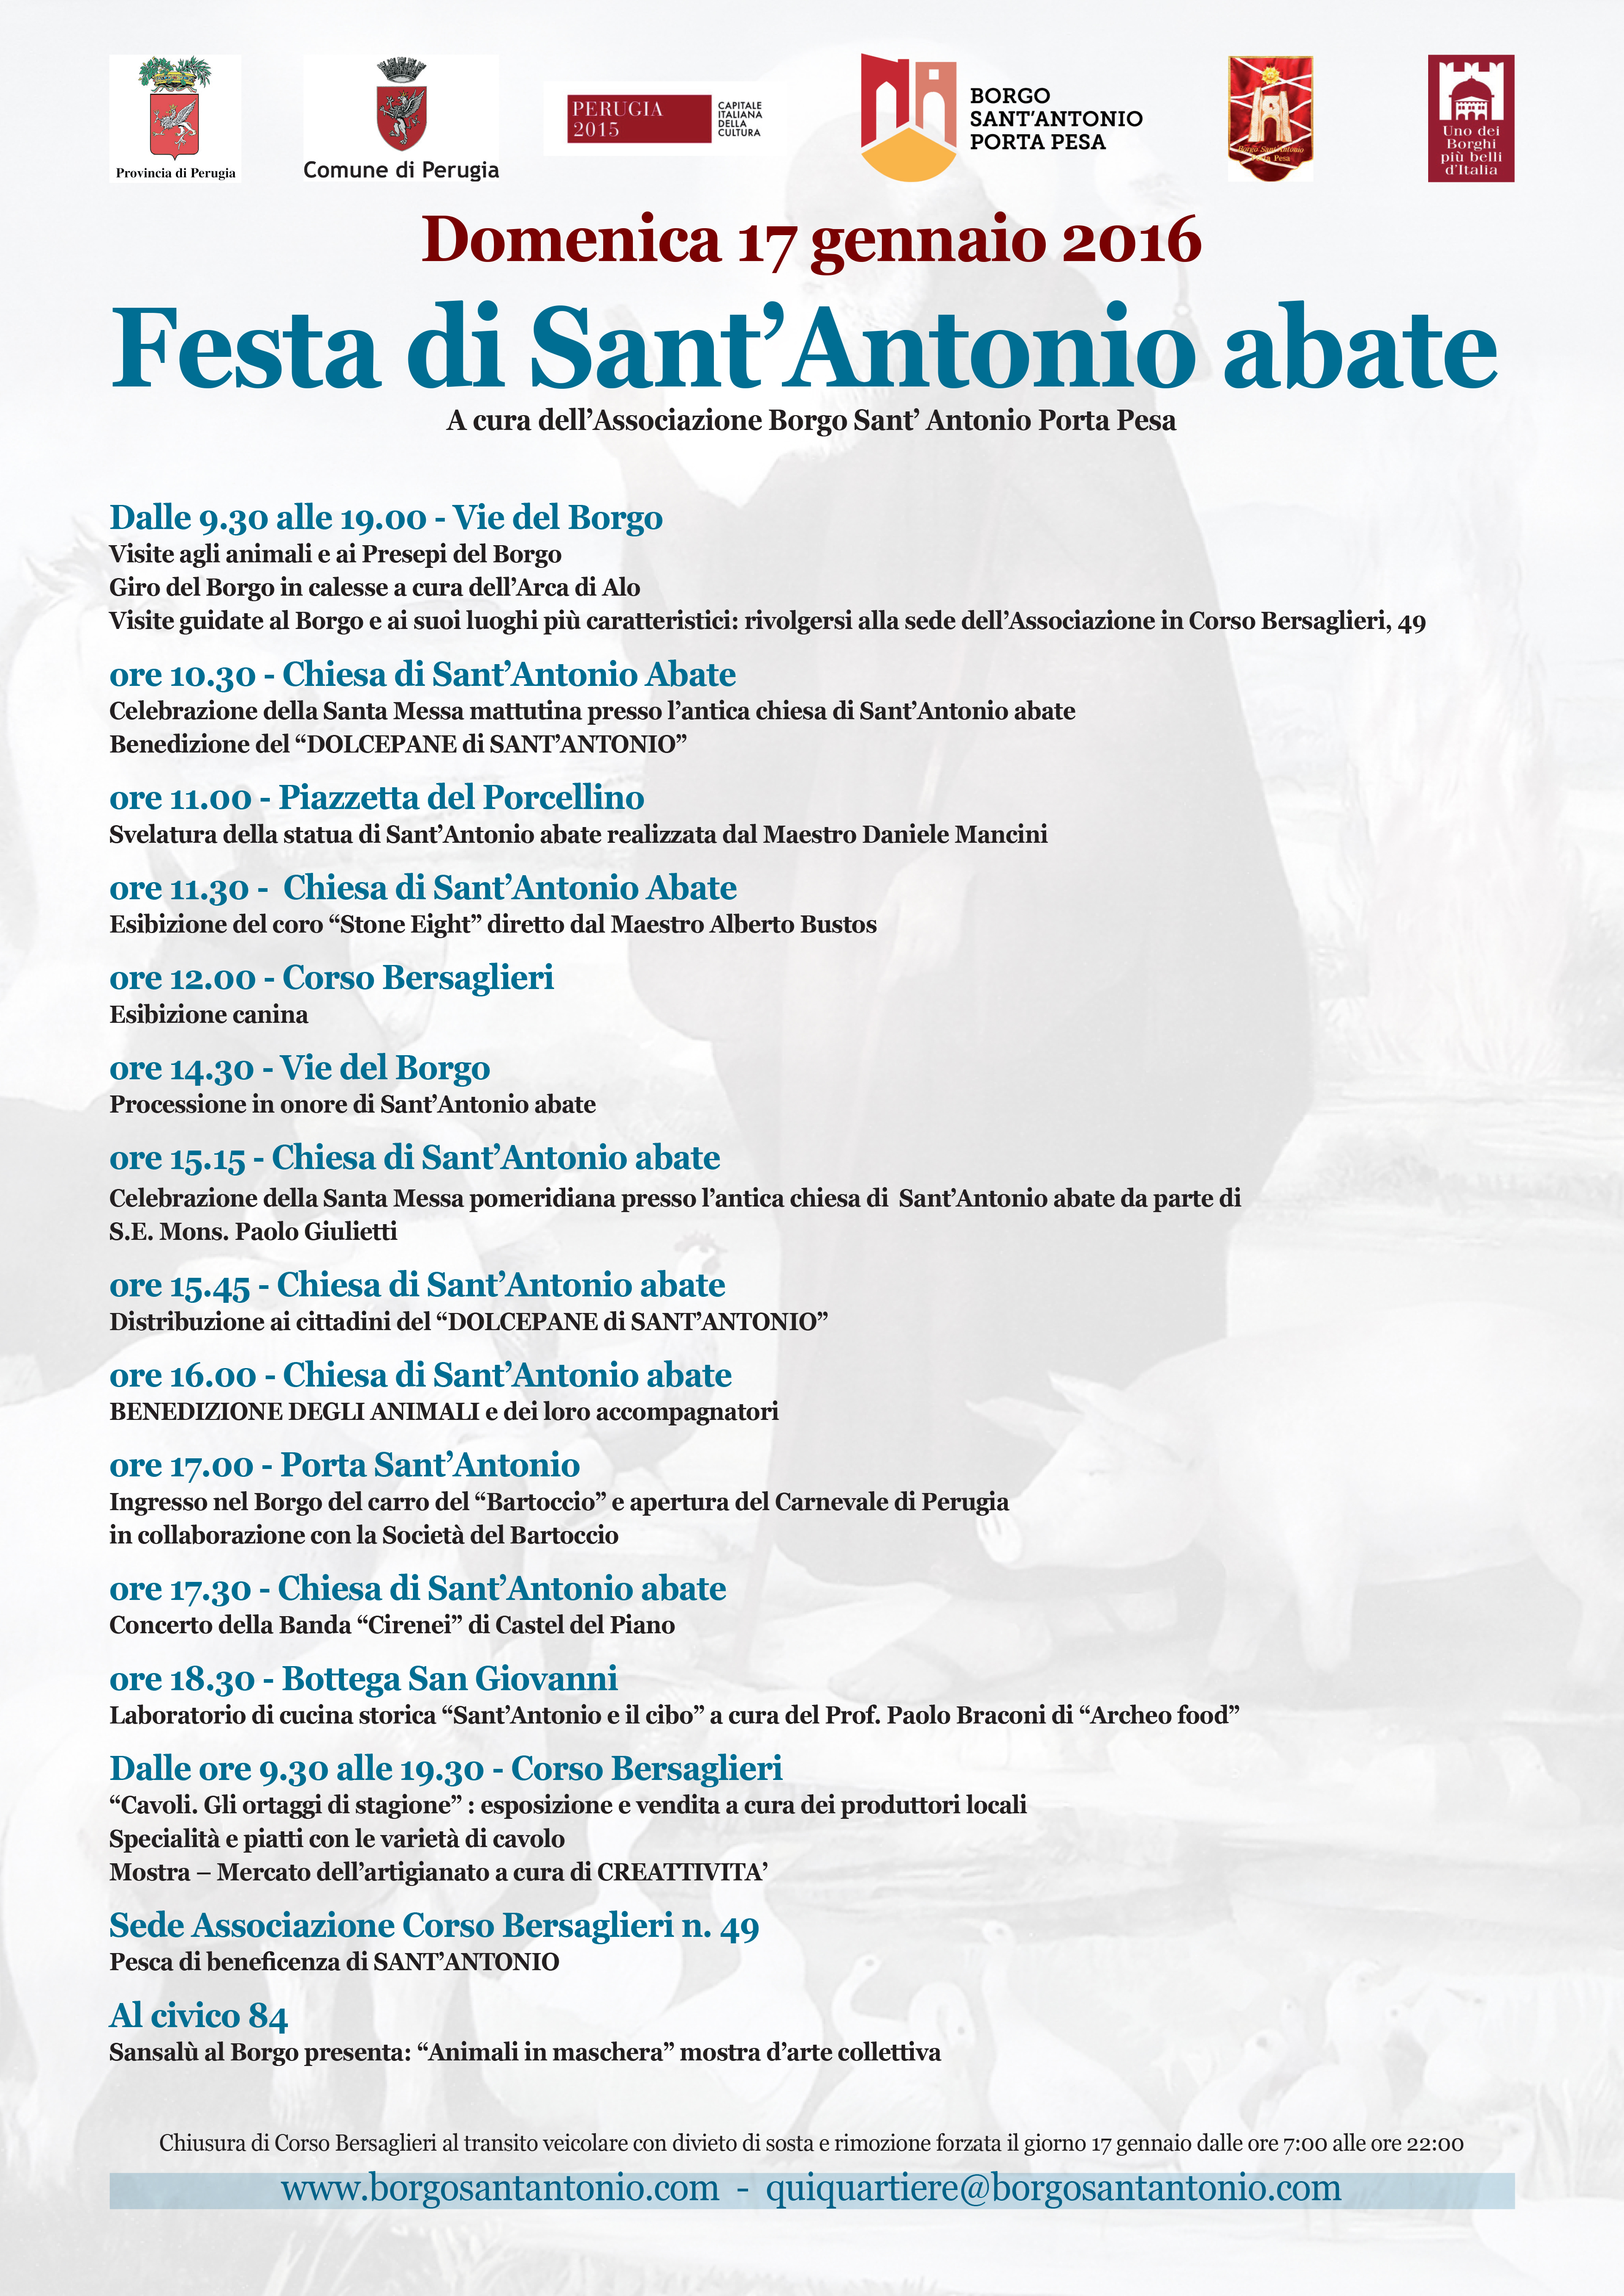 Sant'Antonio Locandina 2016